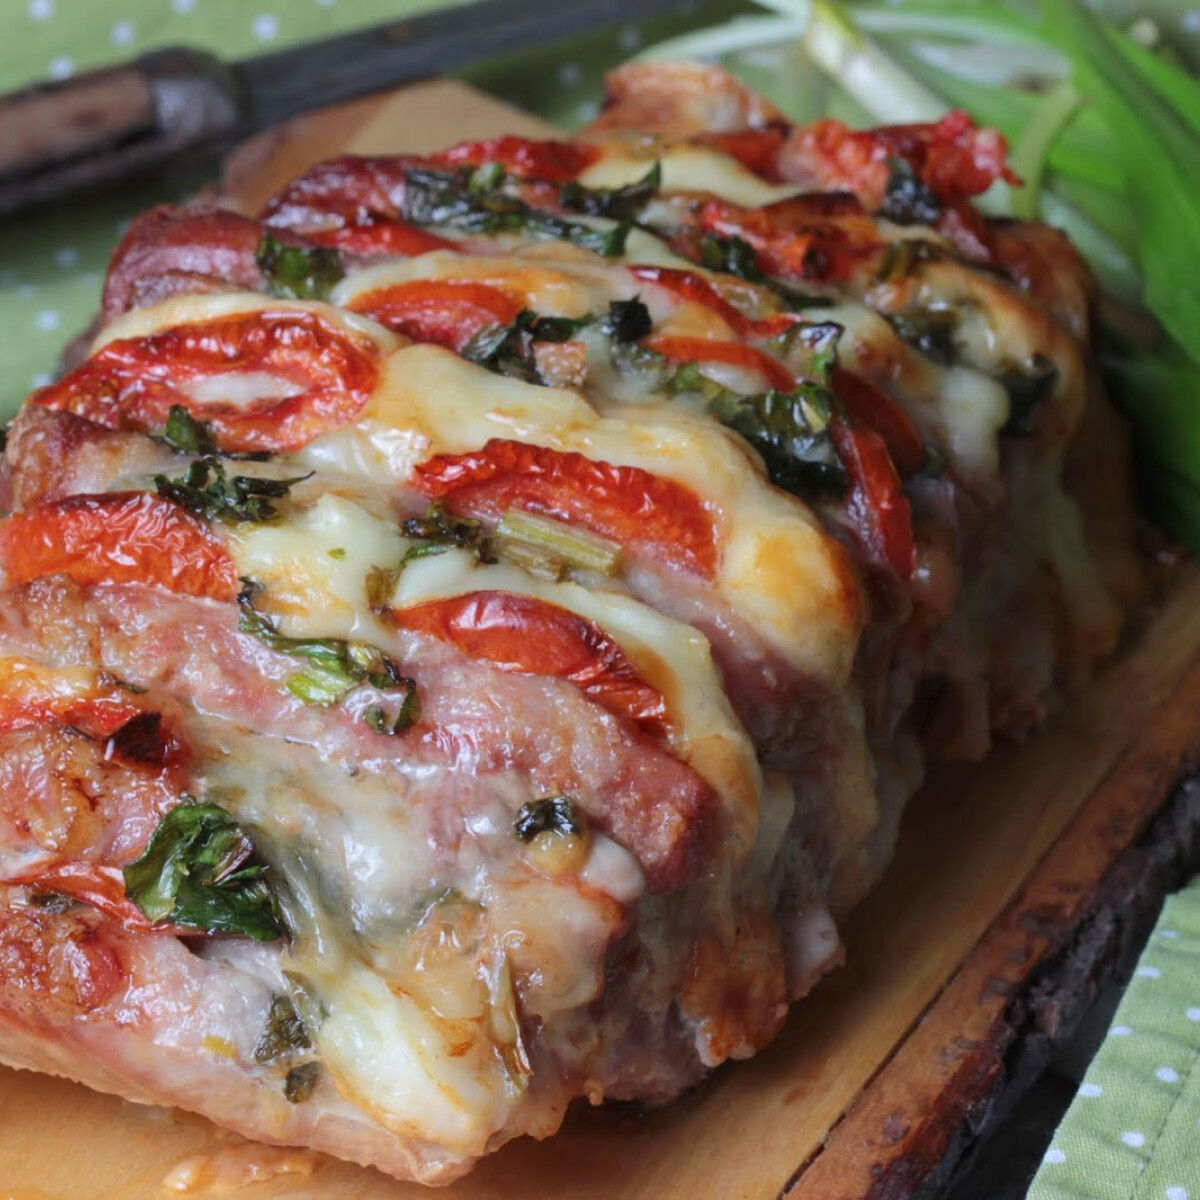 Trikolor zsebes karaj - medvehagyma, sajt és paradicsom karajba rejtve